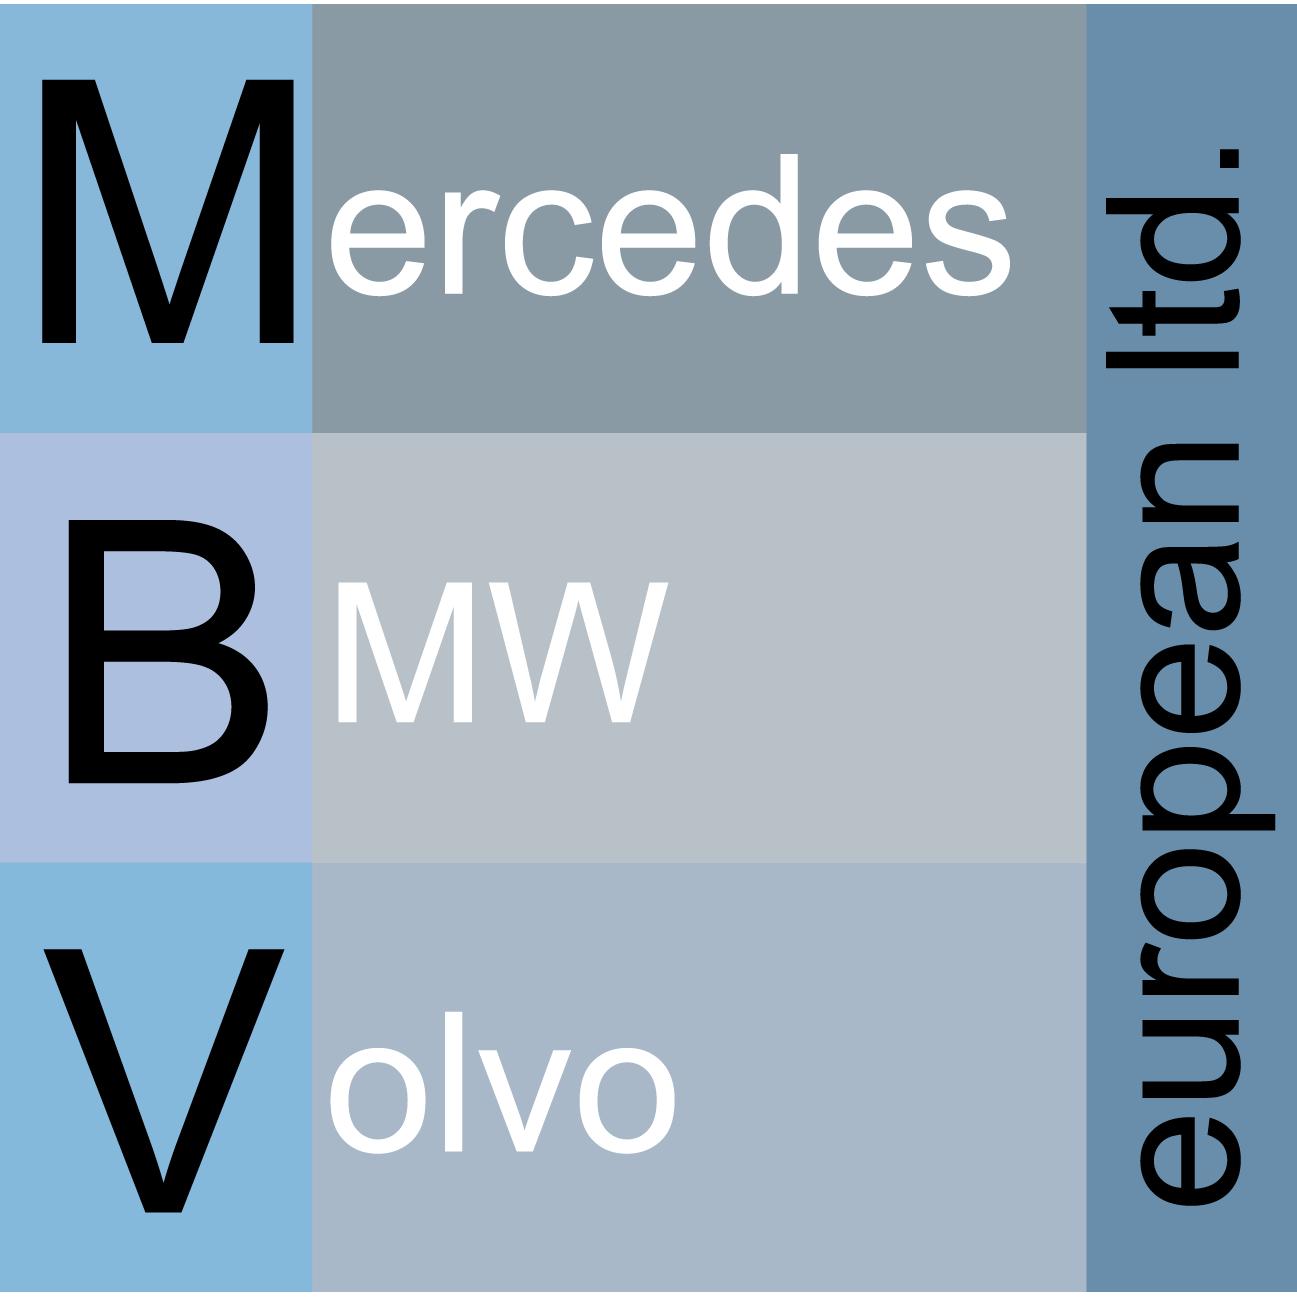 MBV European Ltd - Charlotte, NC - Auto Body Repair & Painting